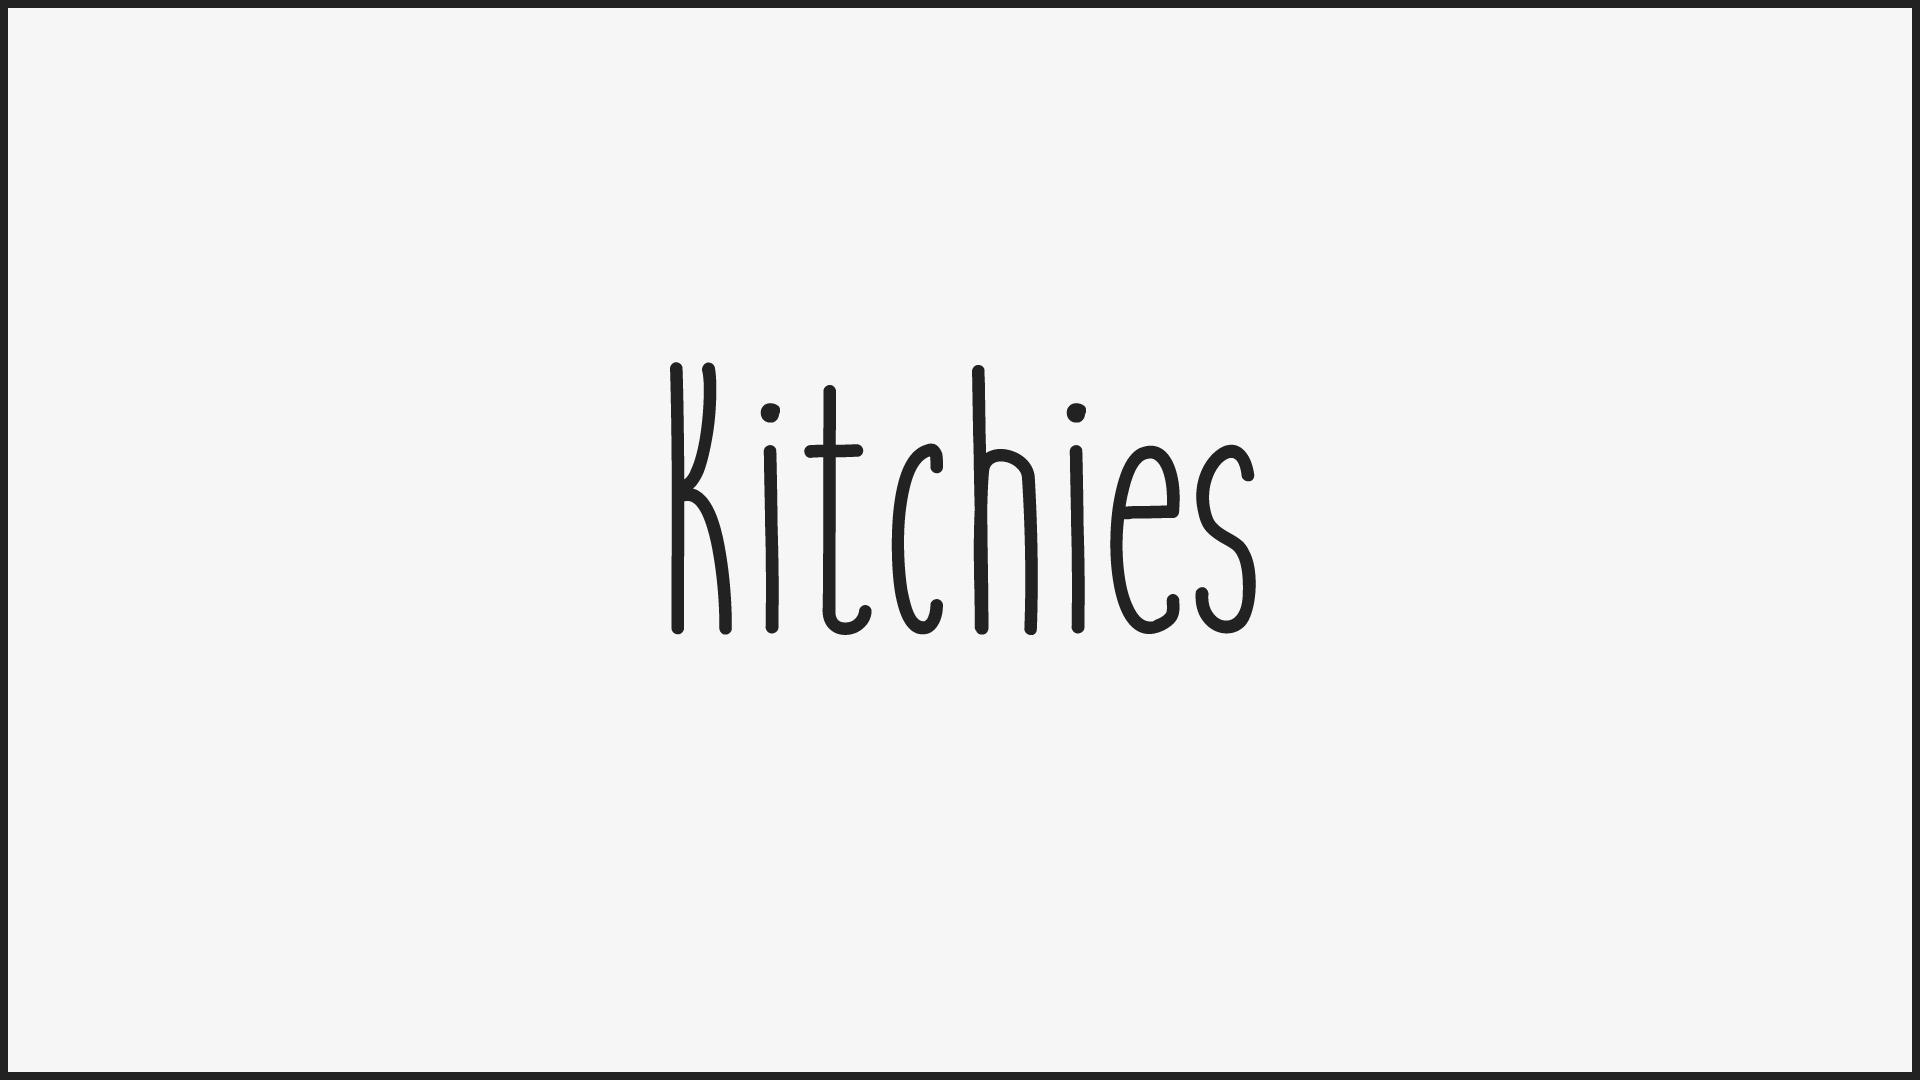 Kitchies